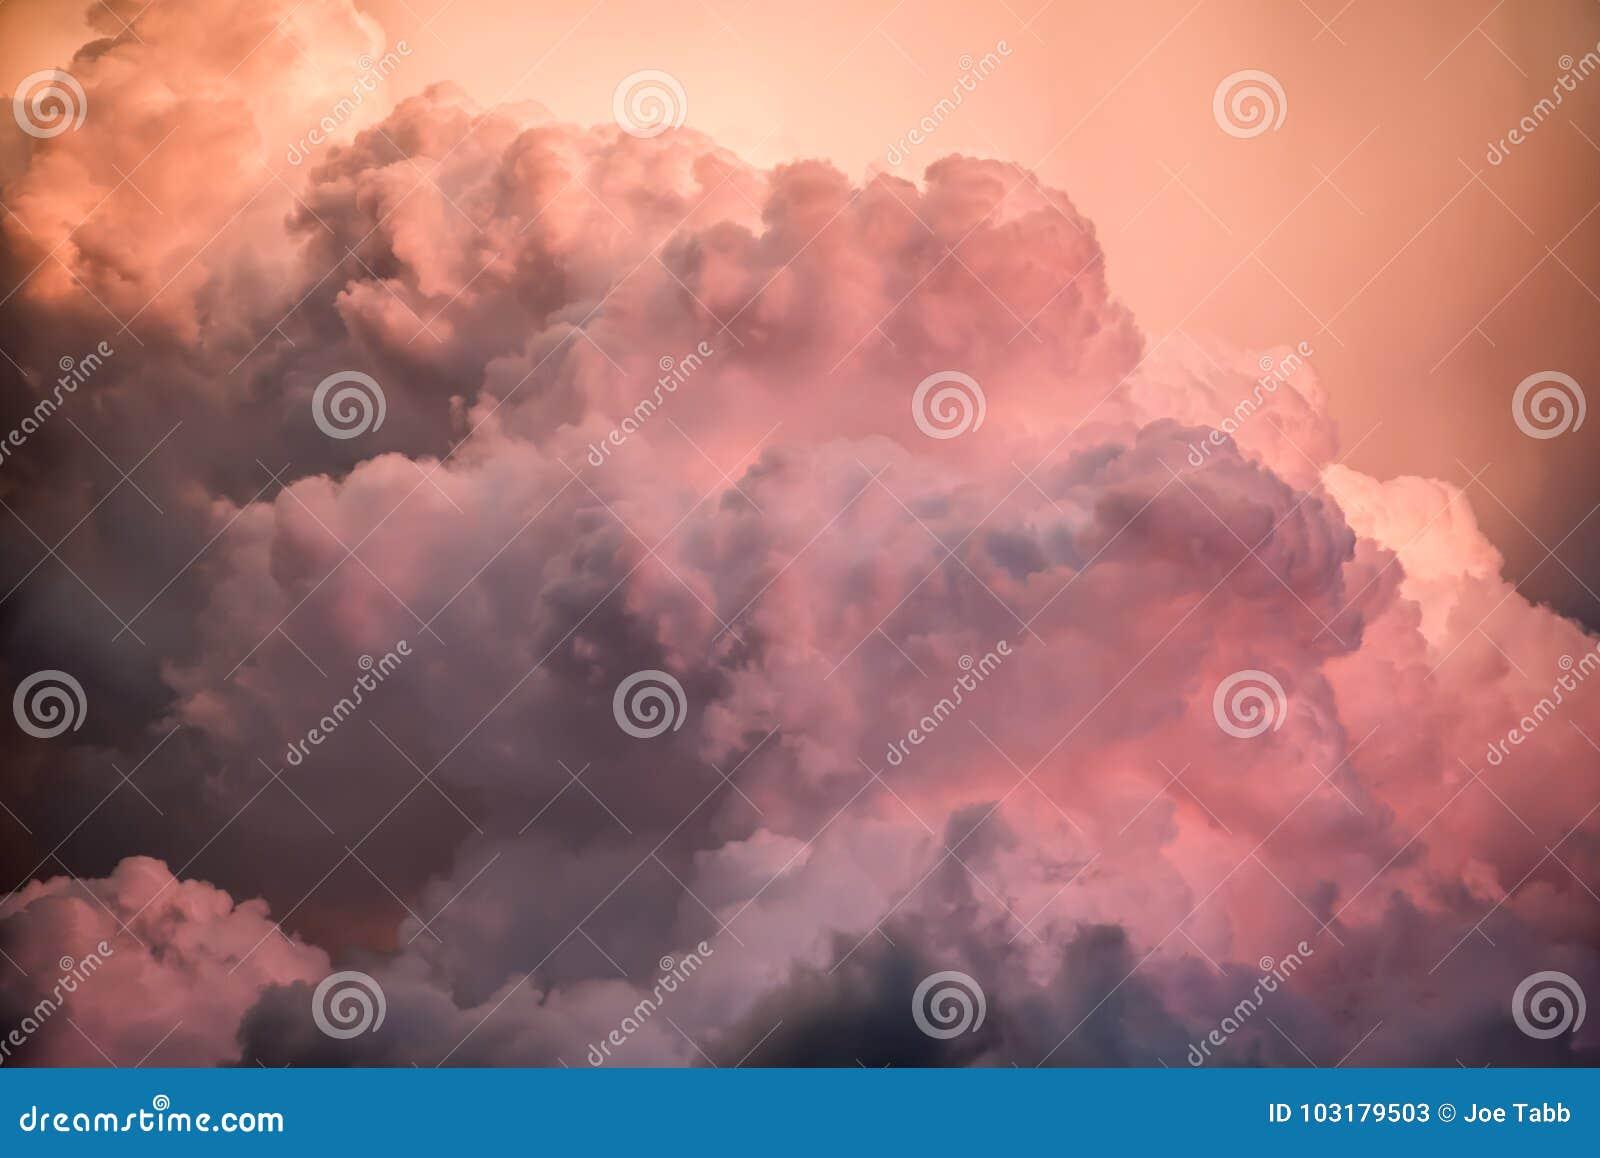 Wolken am susnet